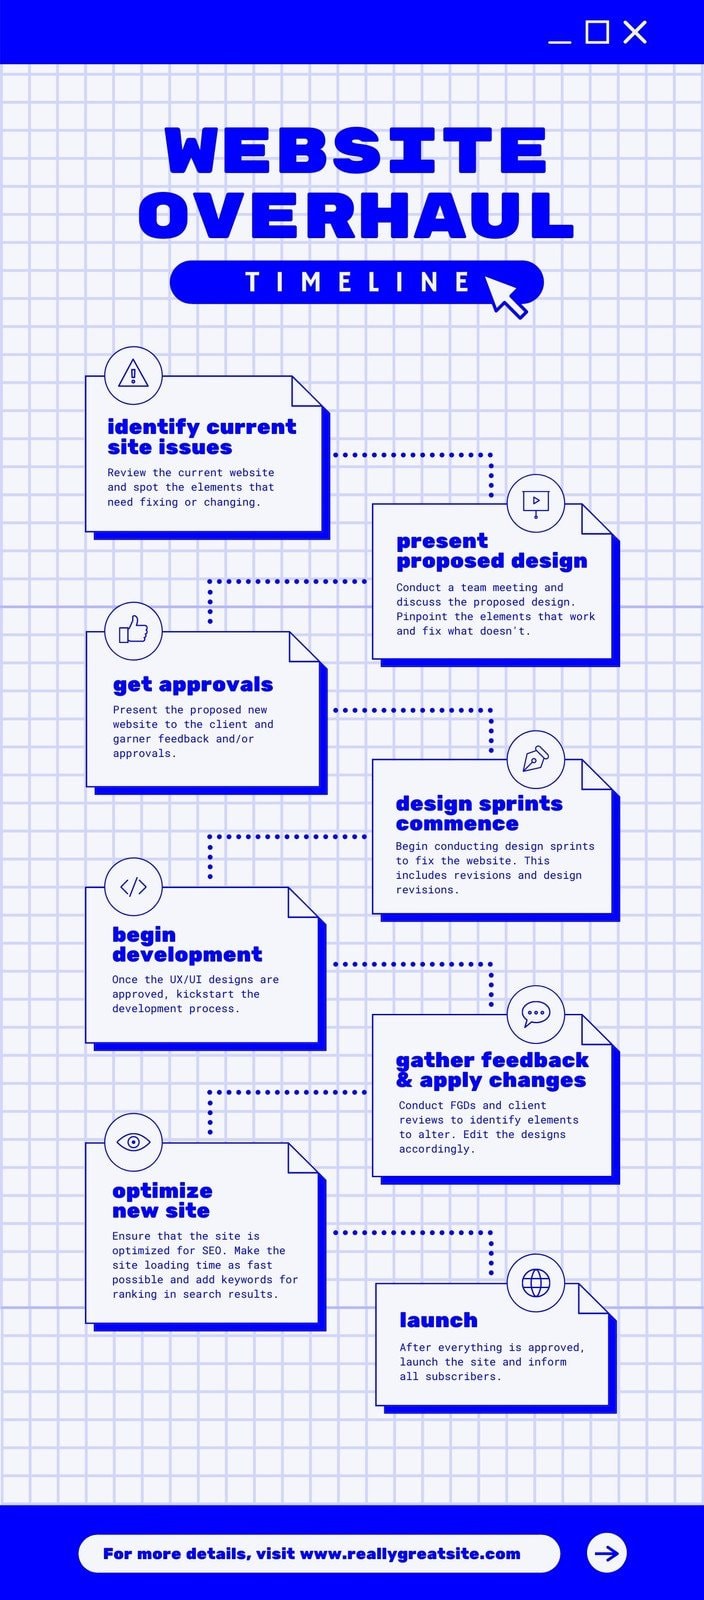 Blue and White Grid Minimalist Monotone Project Progress Timeline Infographic